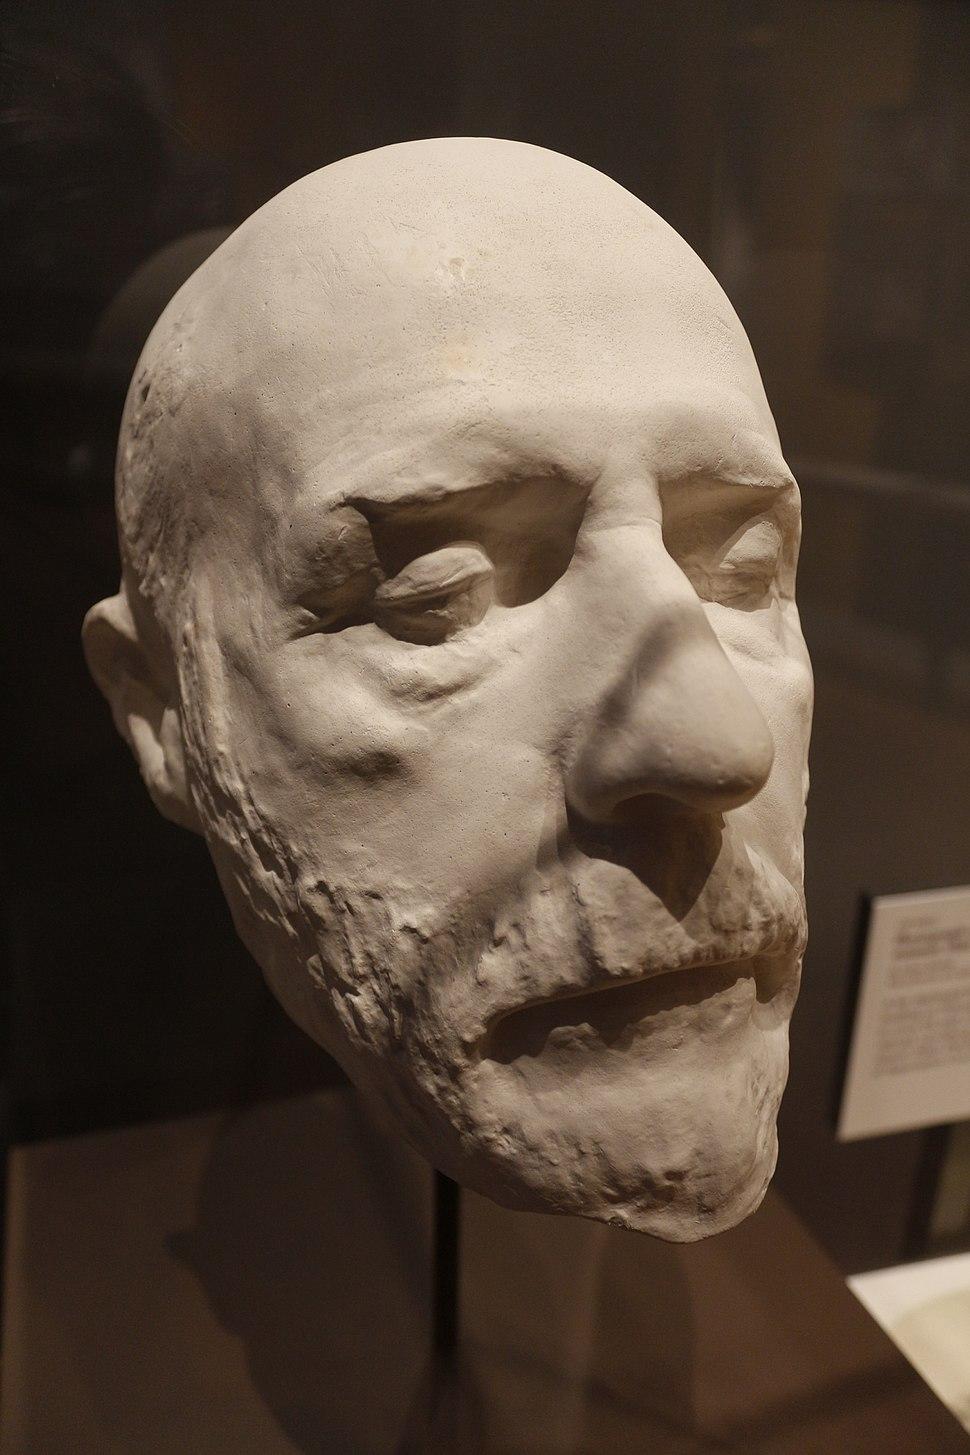 Robert E Lee deathmask